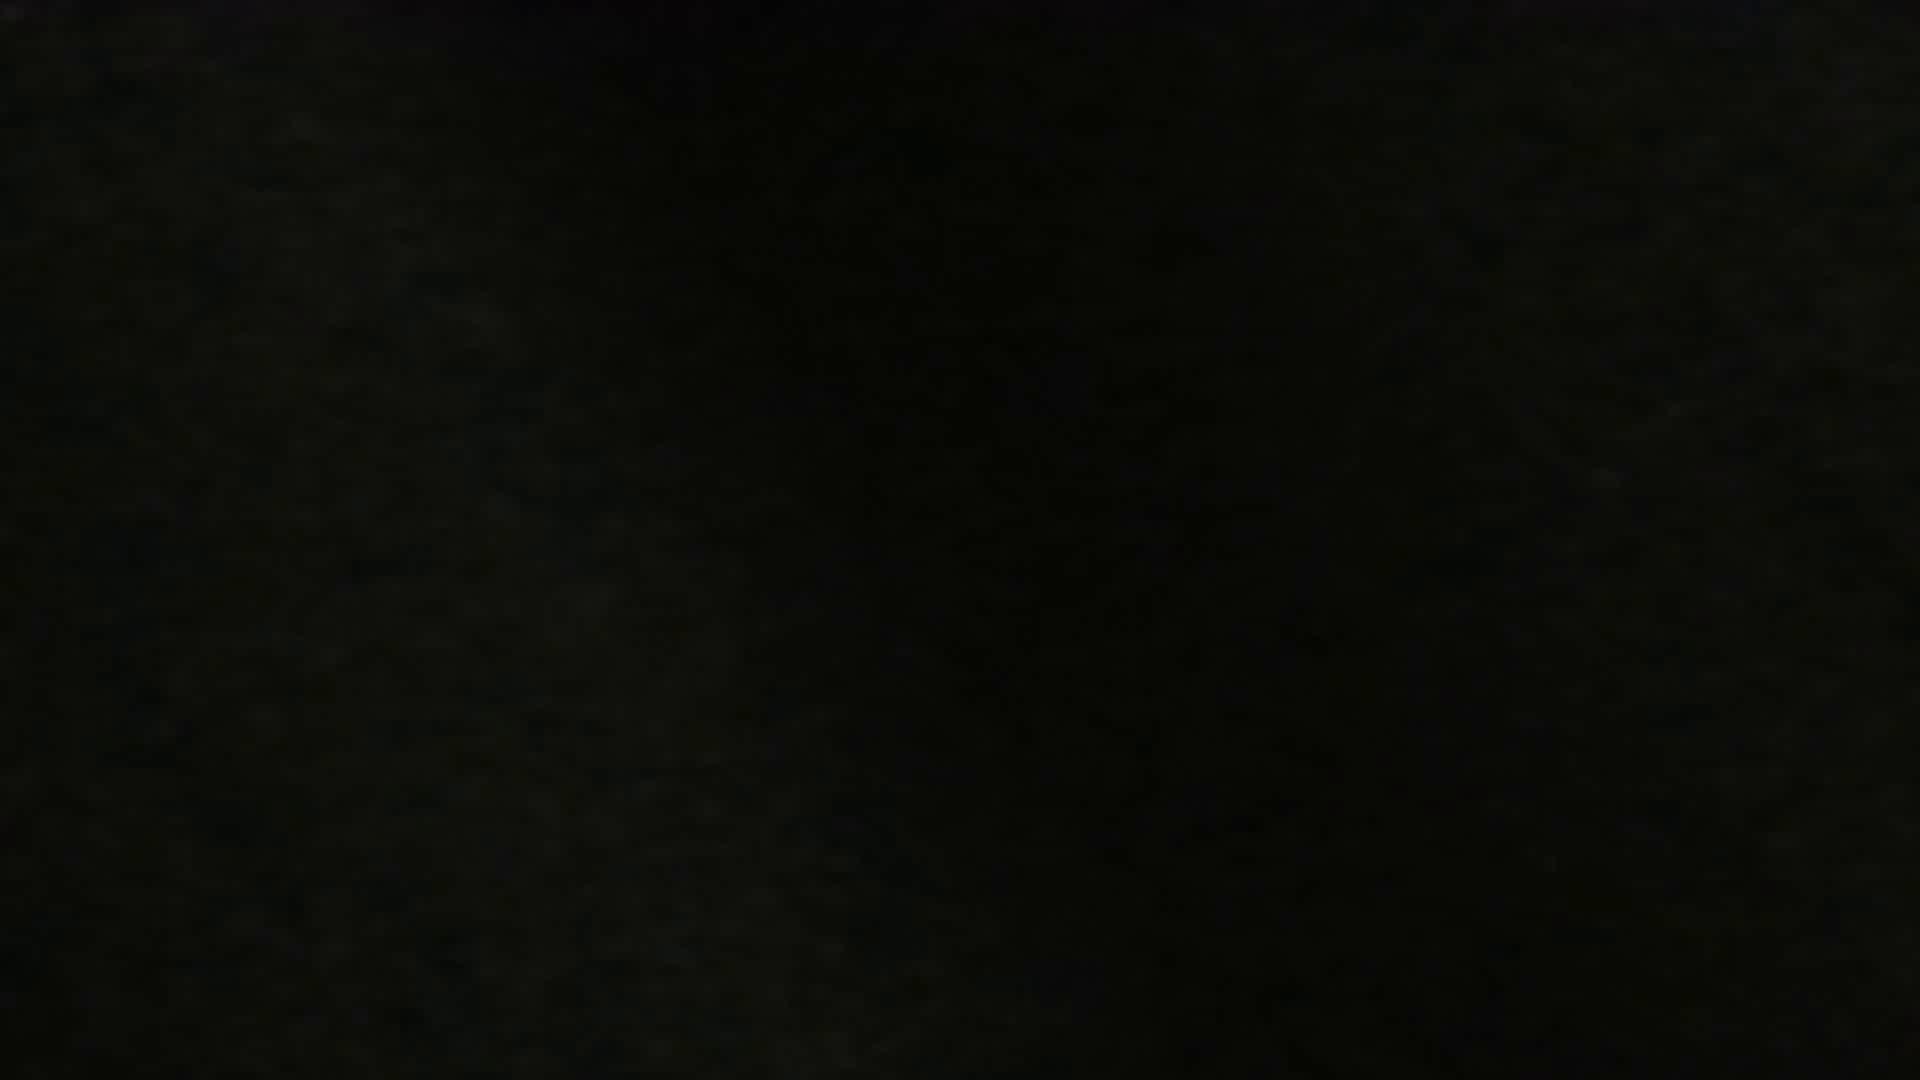 SPYさん初投稿!マンション覗き!5000K!ハイビジョン撮影VOL.05(元サッカー部員社会人) スポーツマン  38pic 9